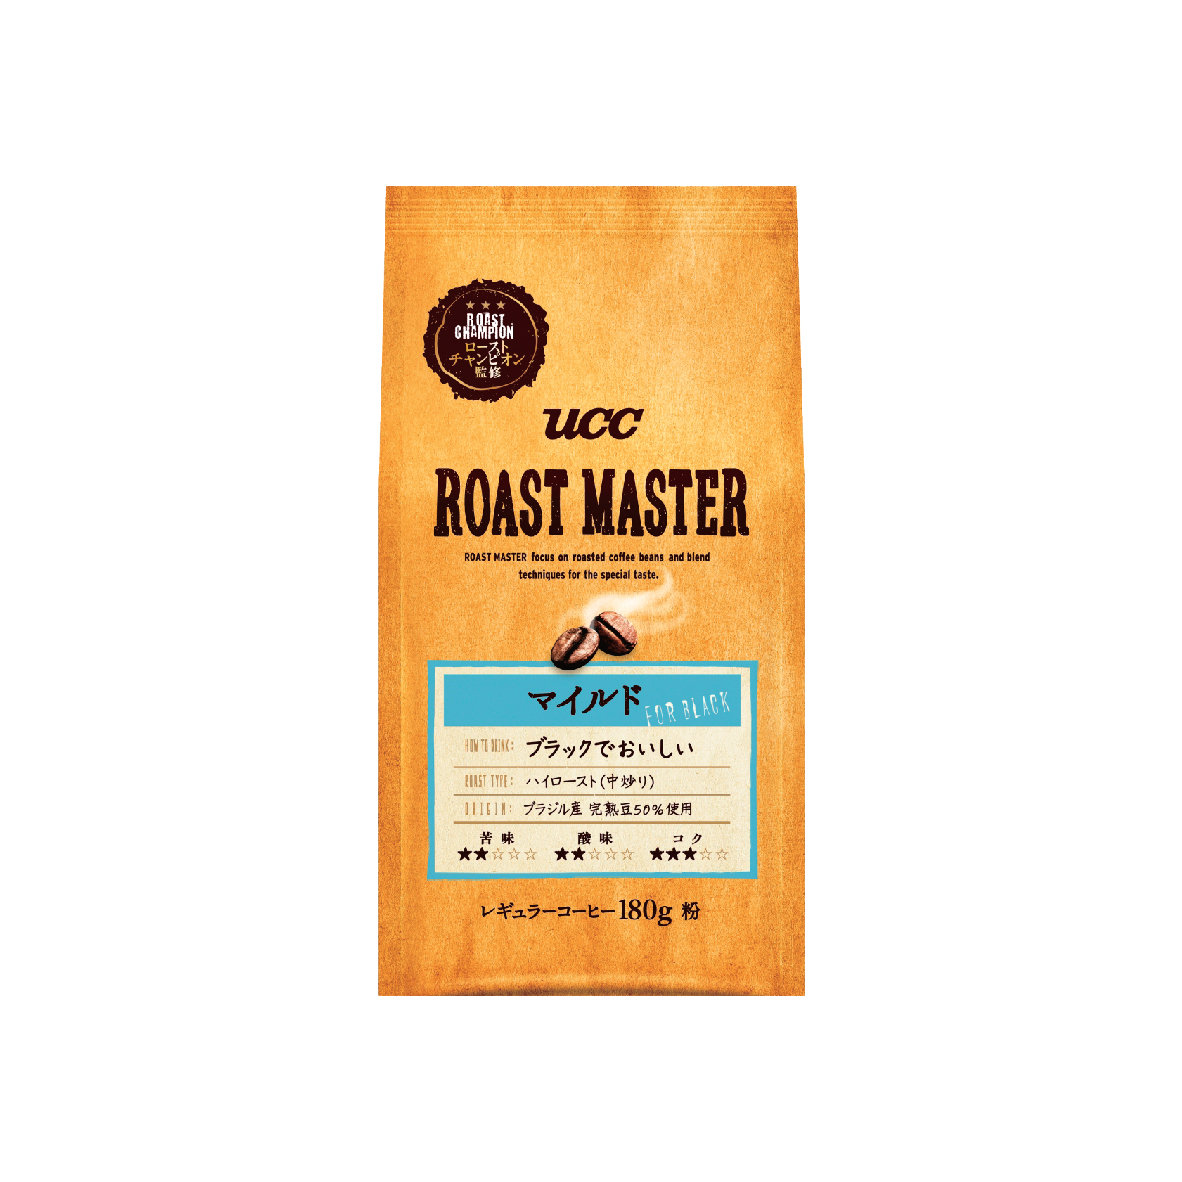 UCC Roast Master Mild Coffee Blend Ground Coffee